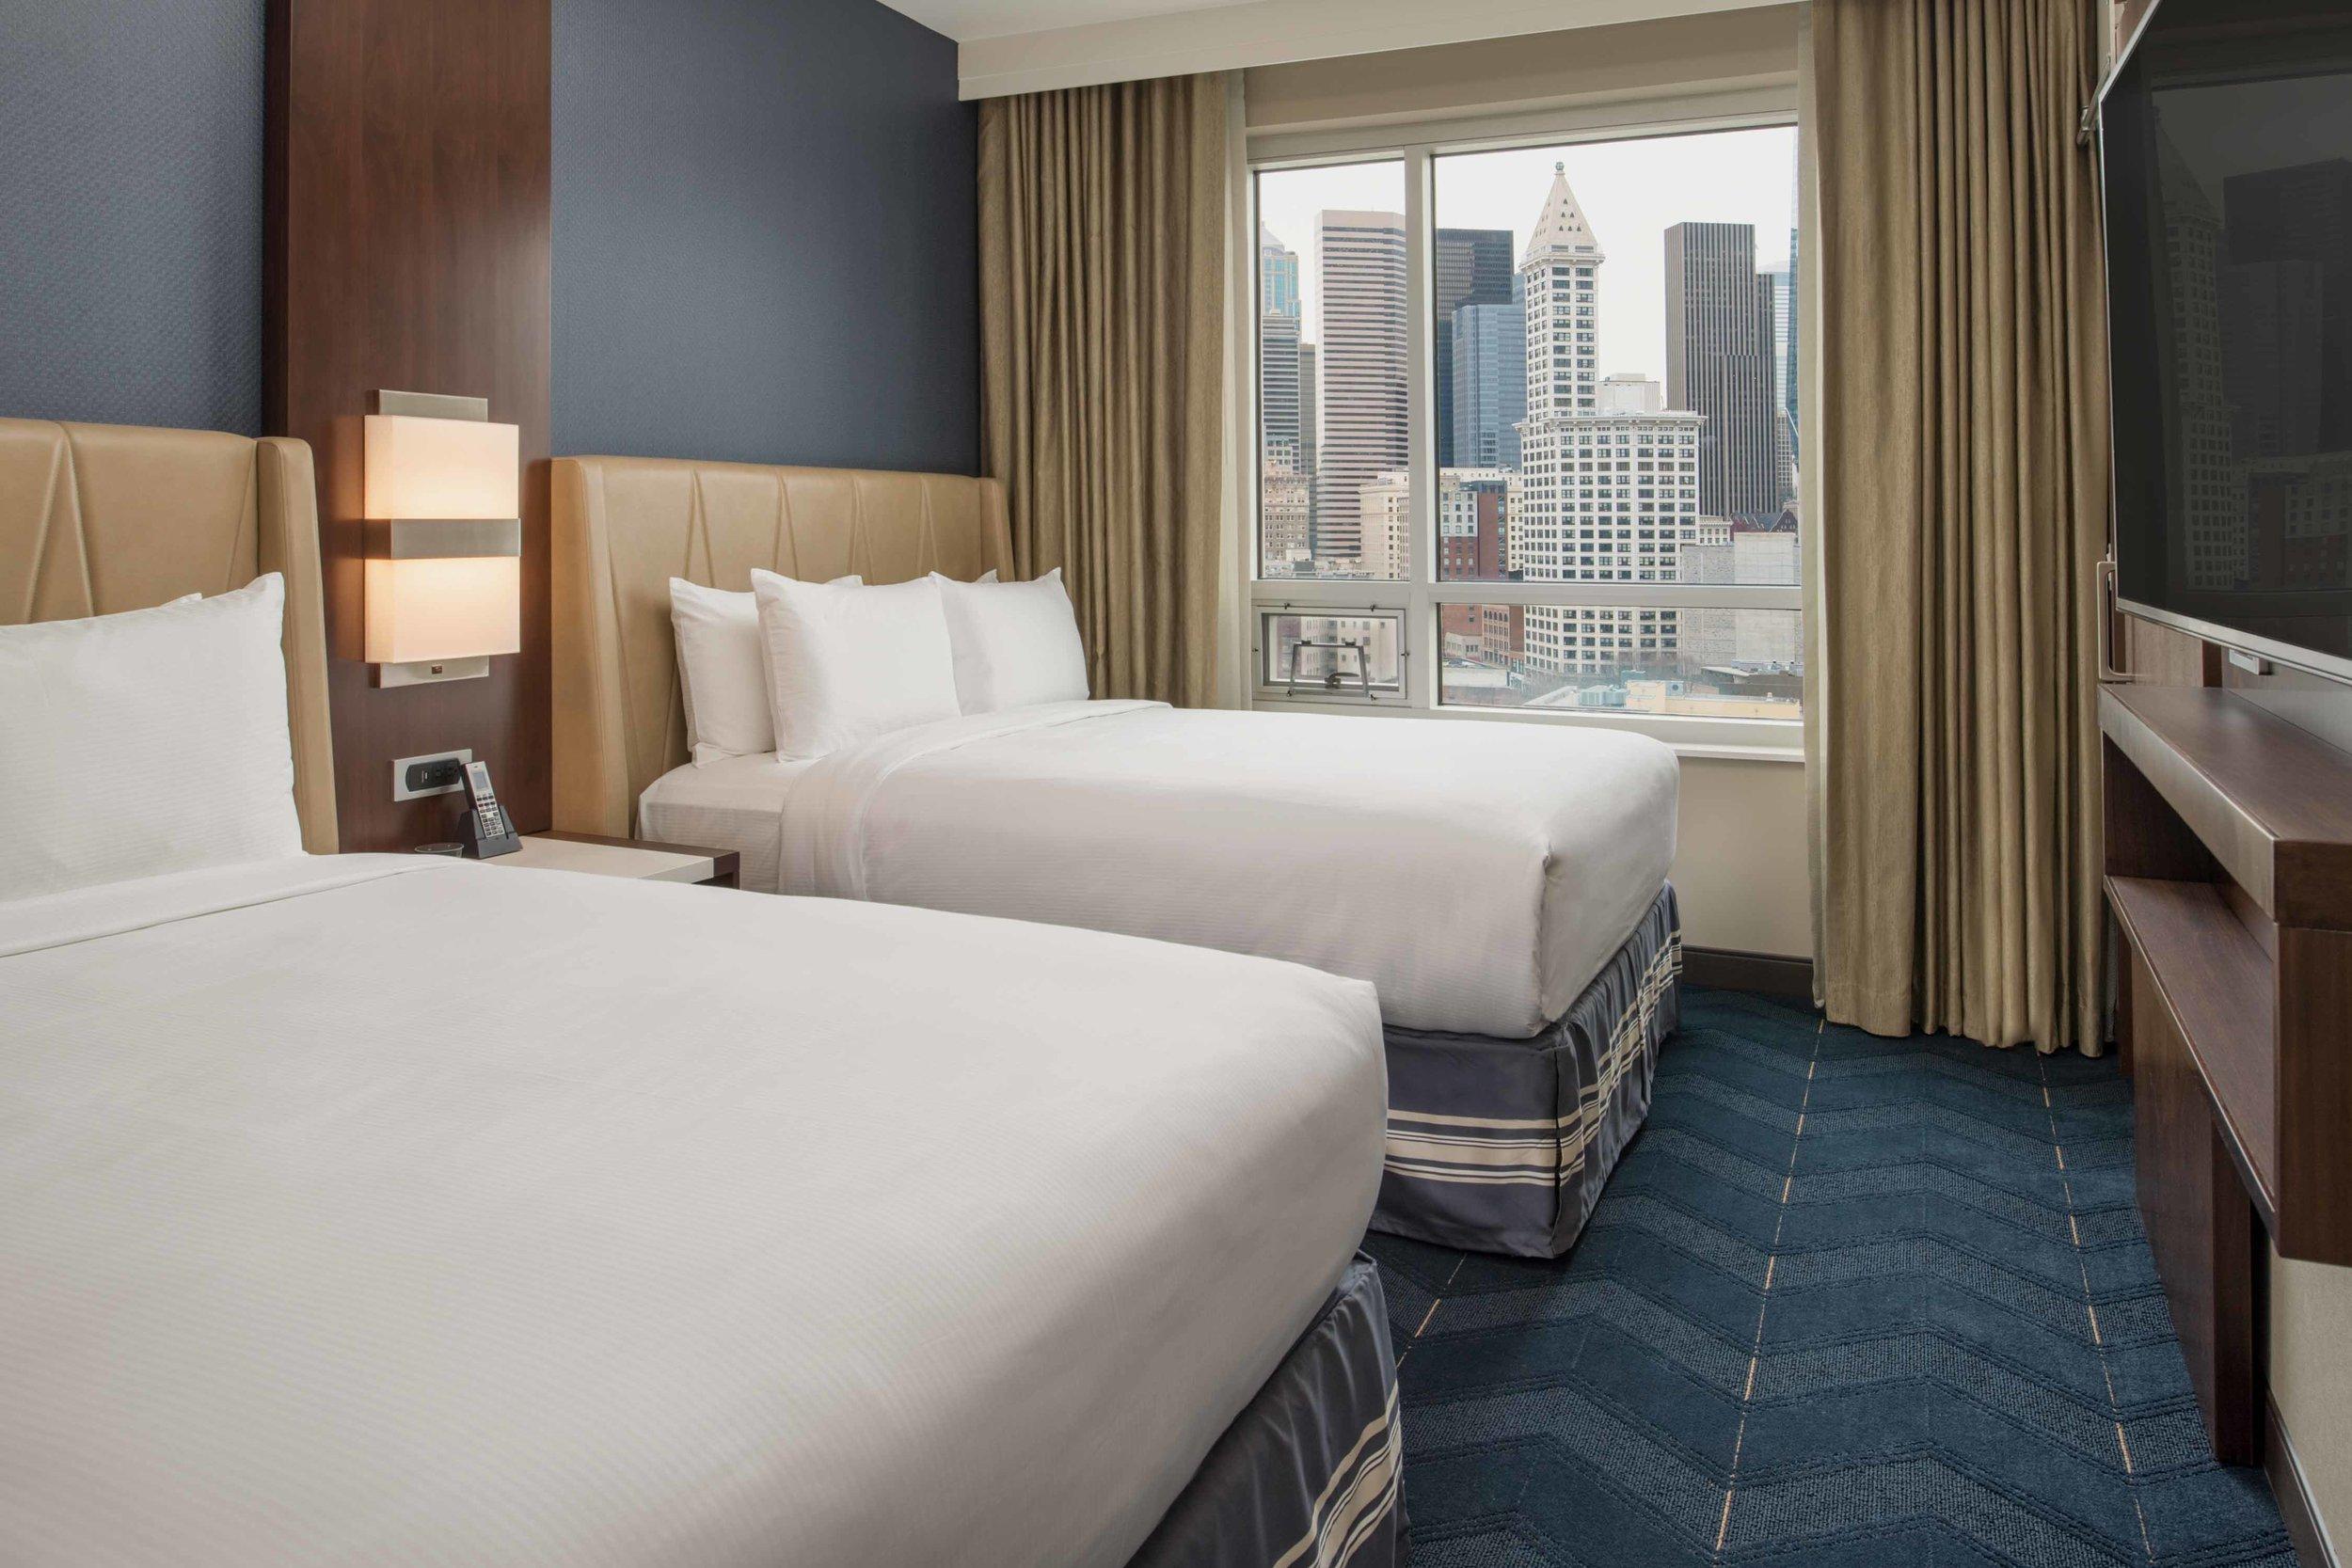 ESSD_Room_NQSQJ_Bed.jpg